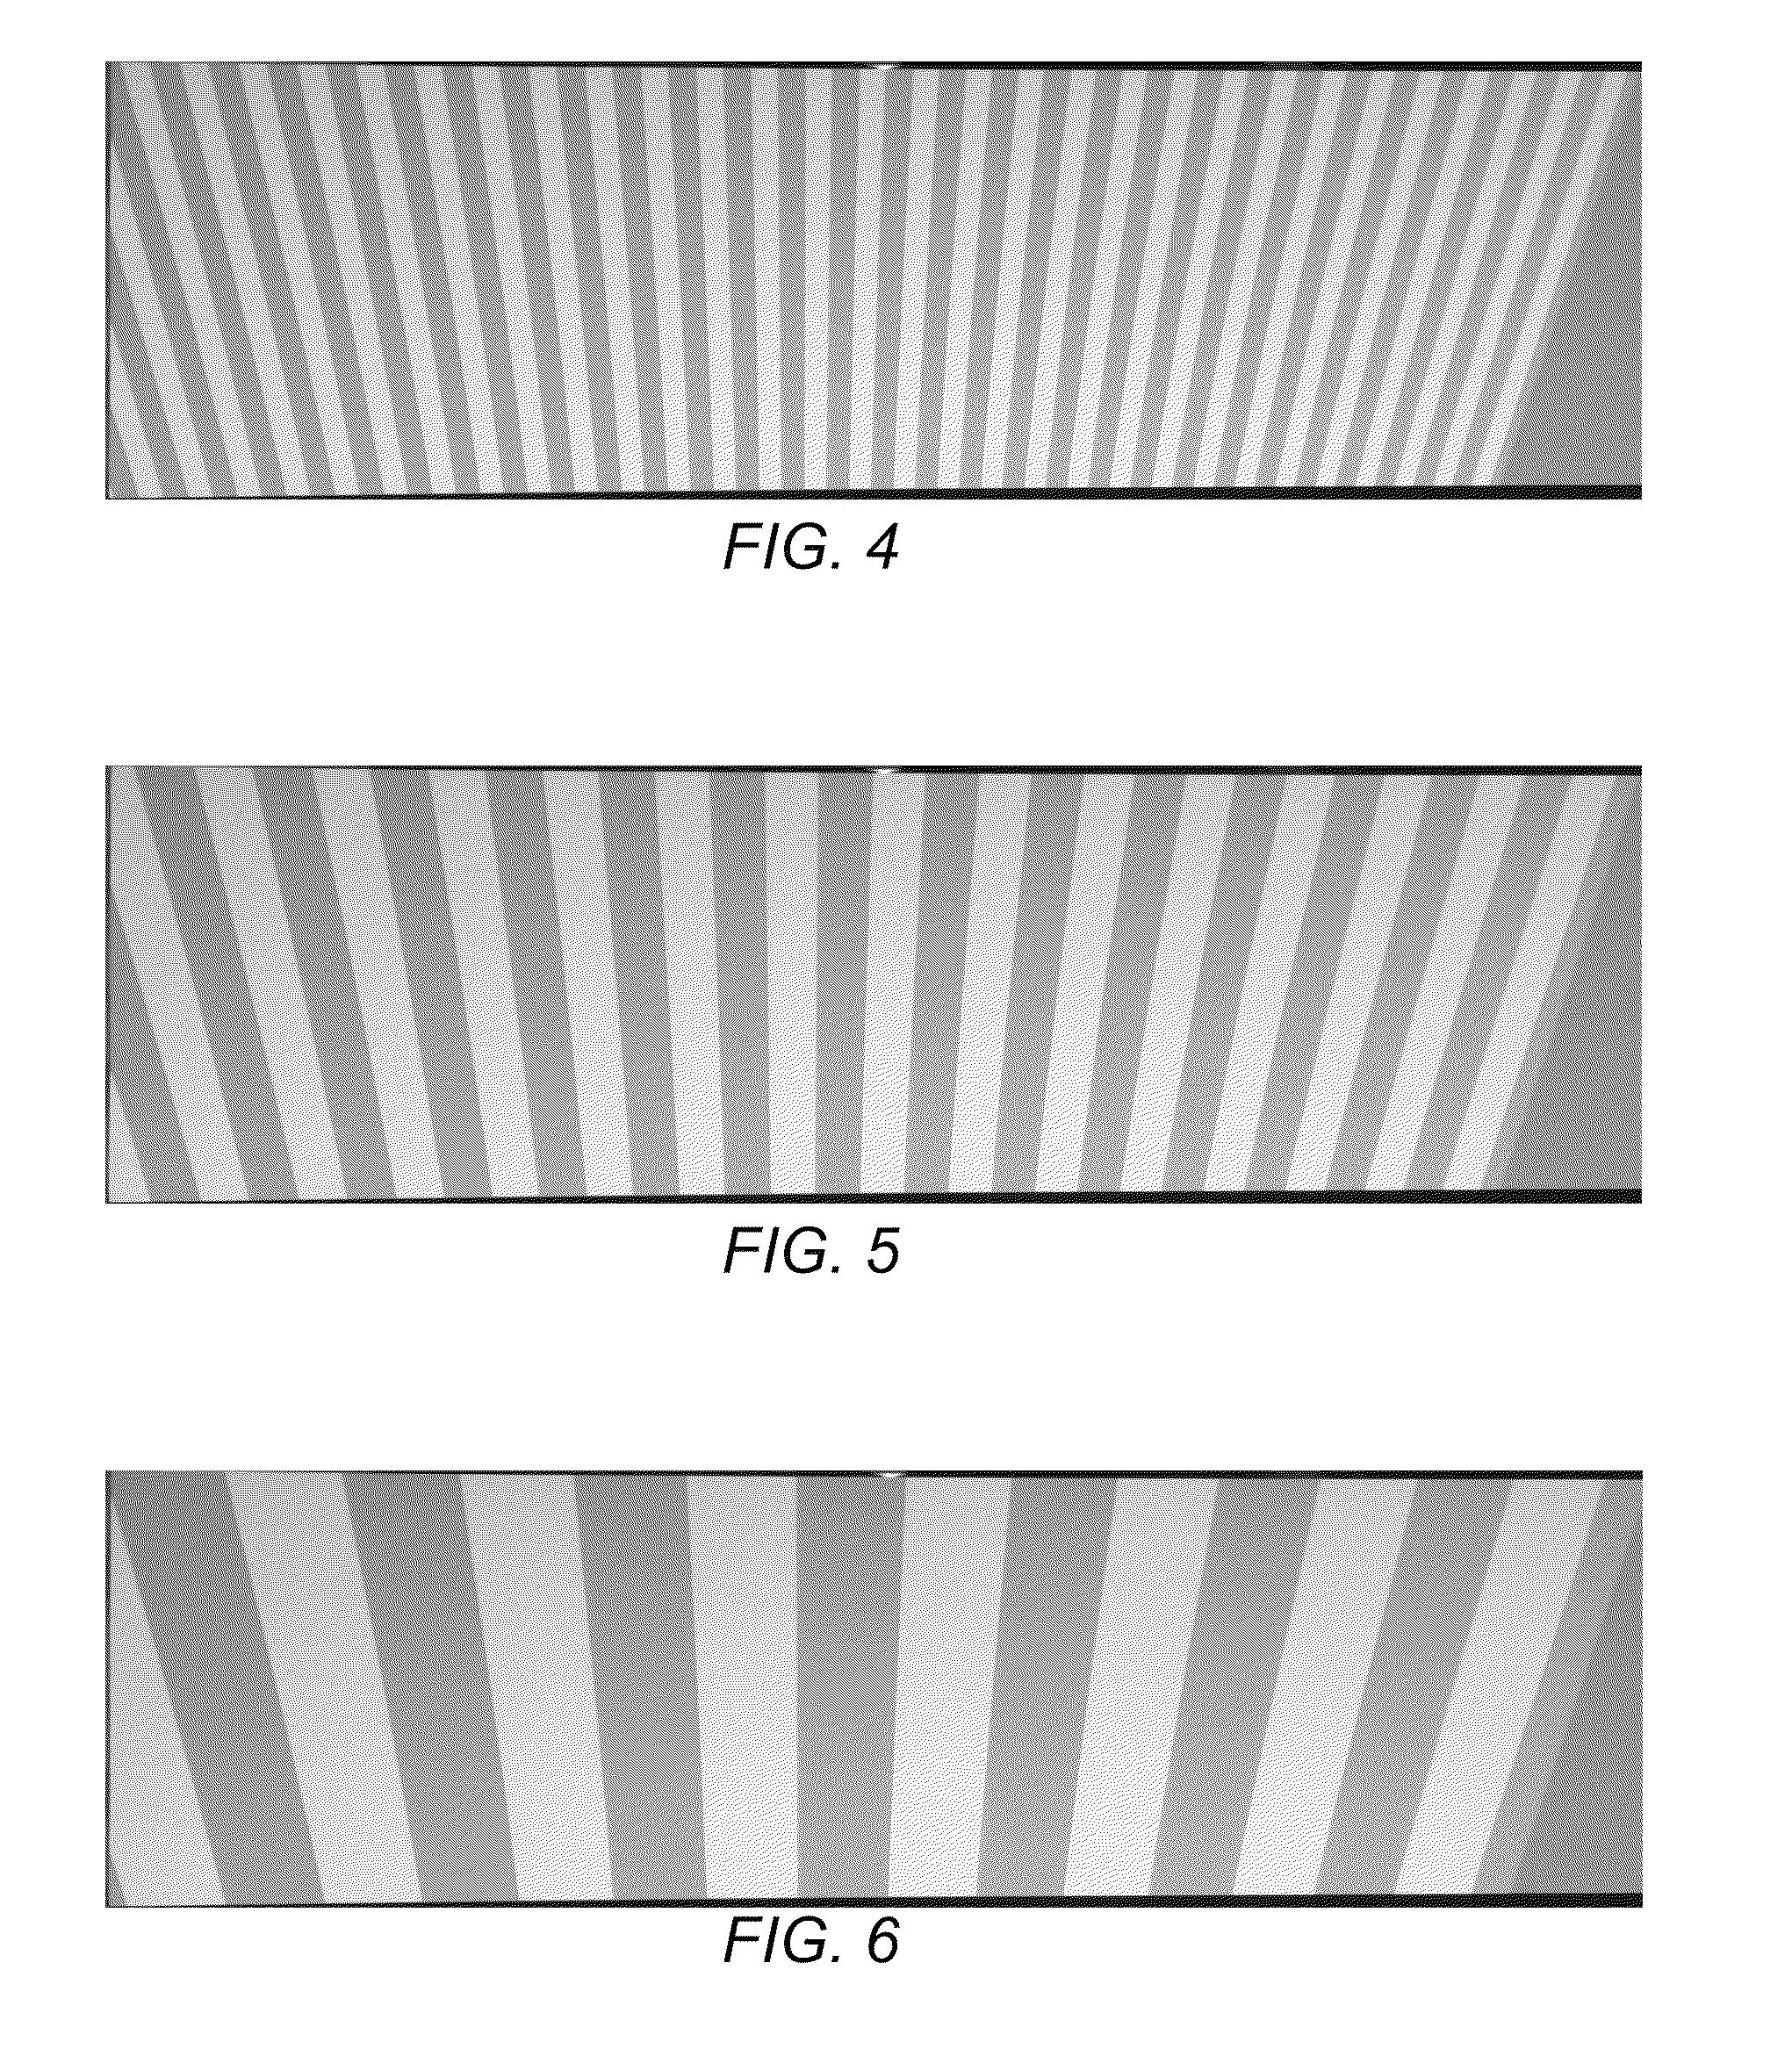 Vertical lines stripes 4 pixel line width 8 pixel line spacing grey - Patent Drawing